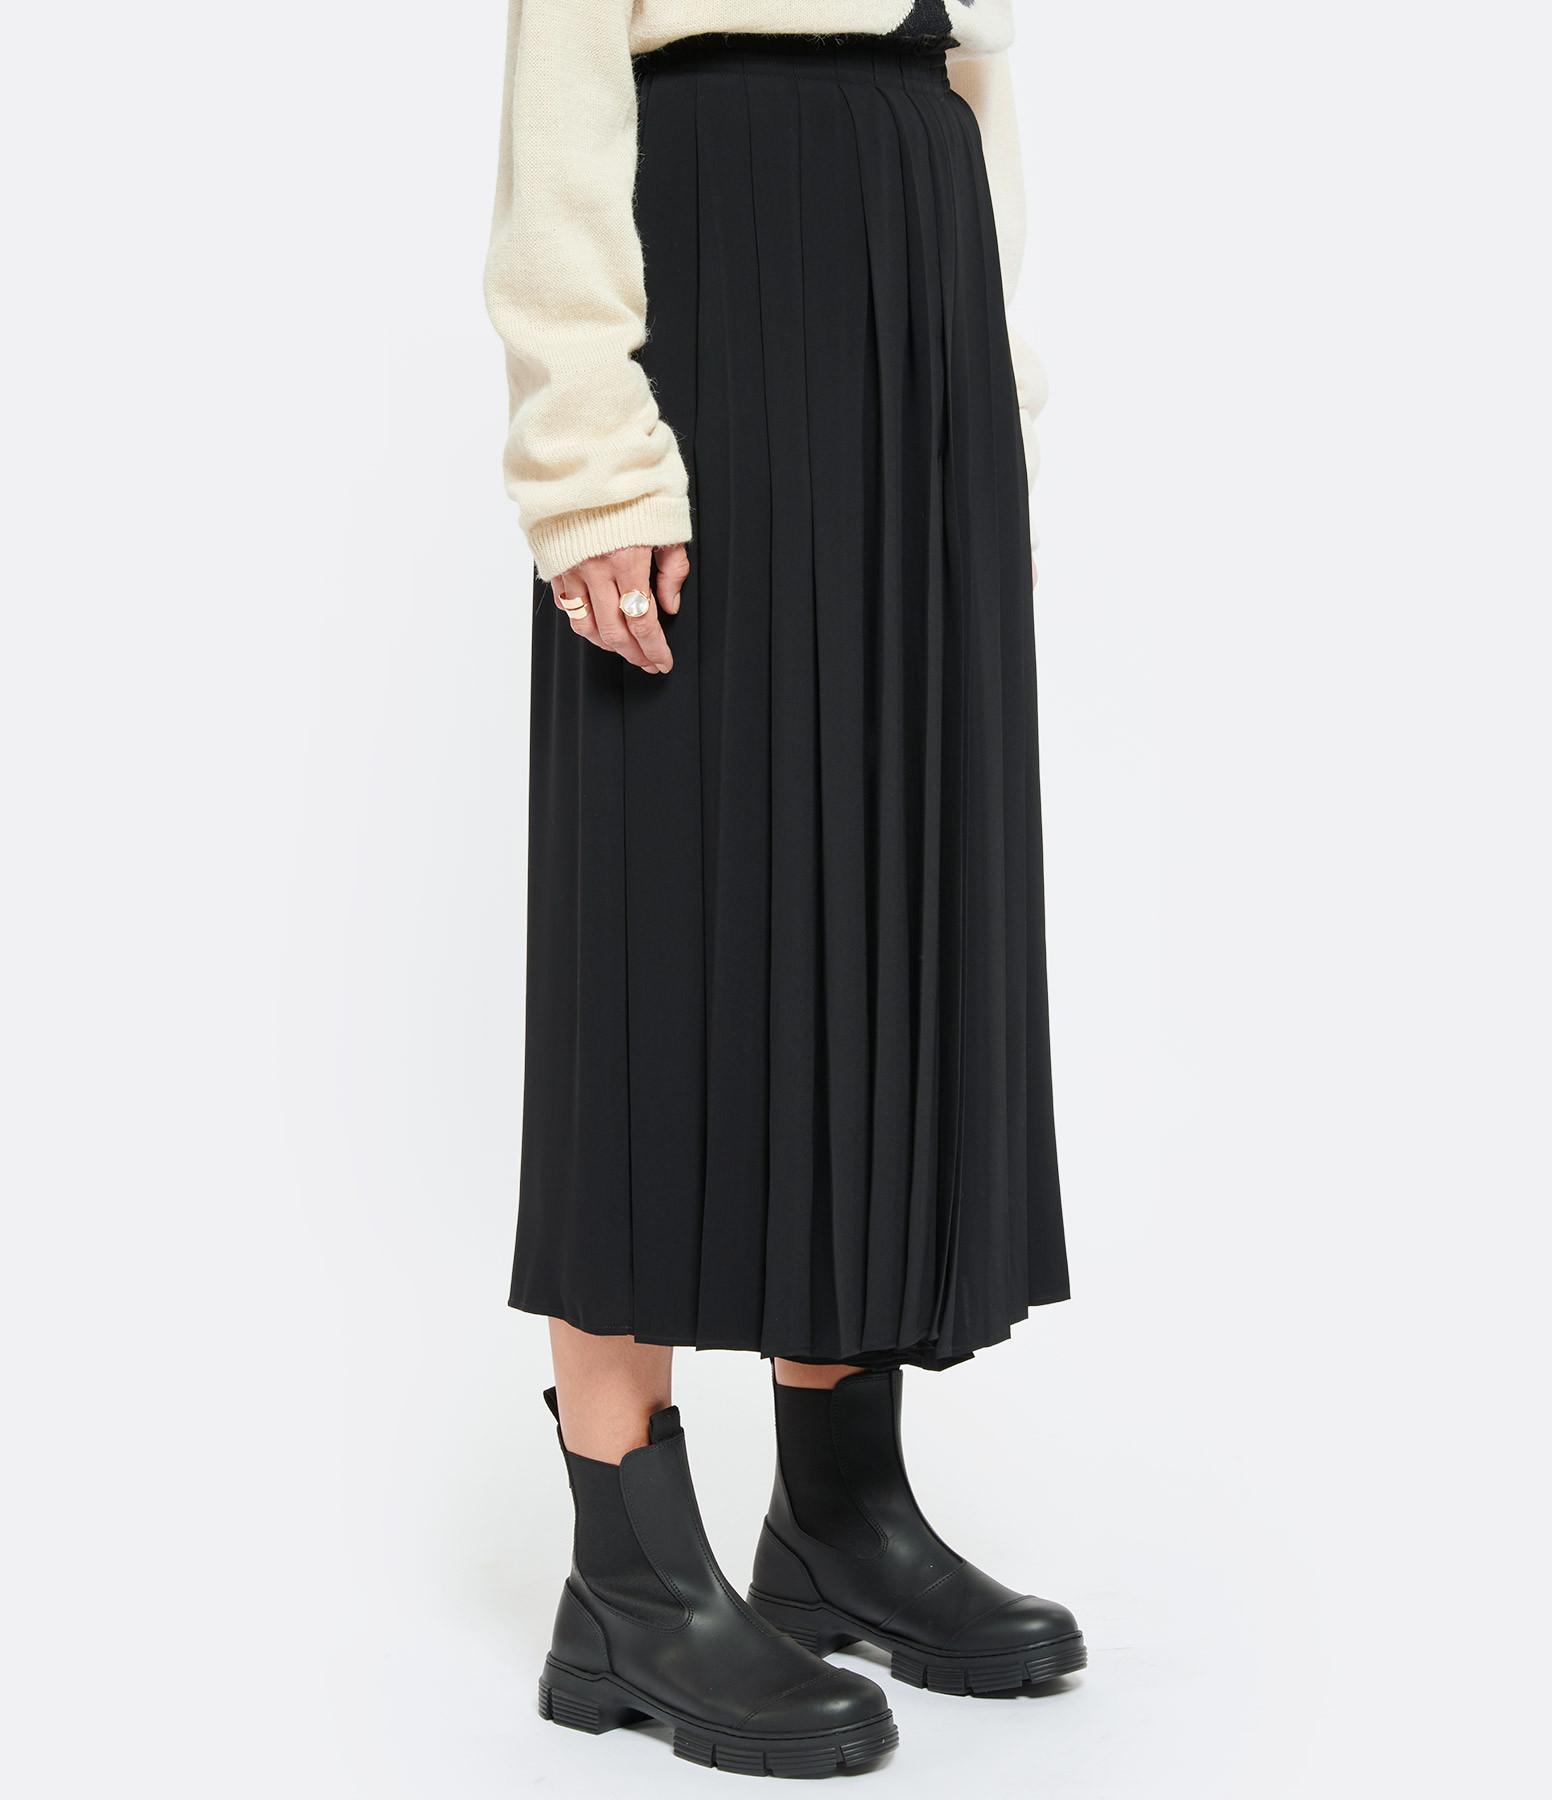 MM6 MAISON MARGIELA - Pantalon Noir